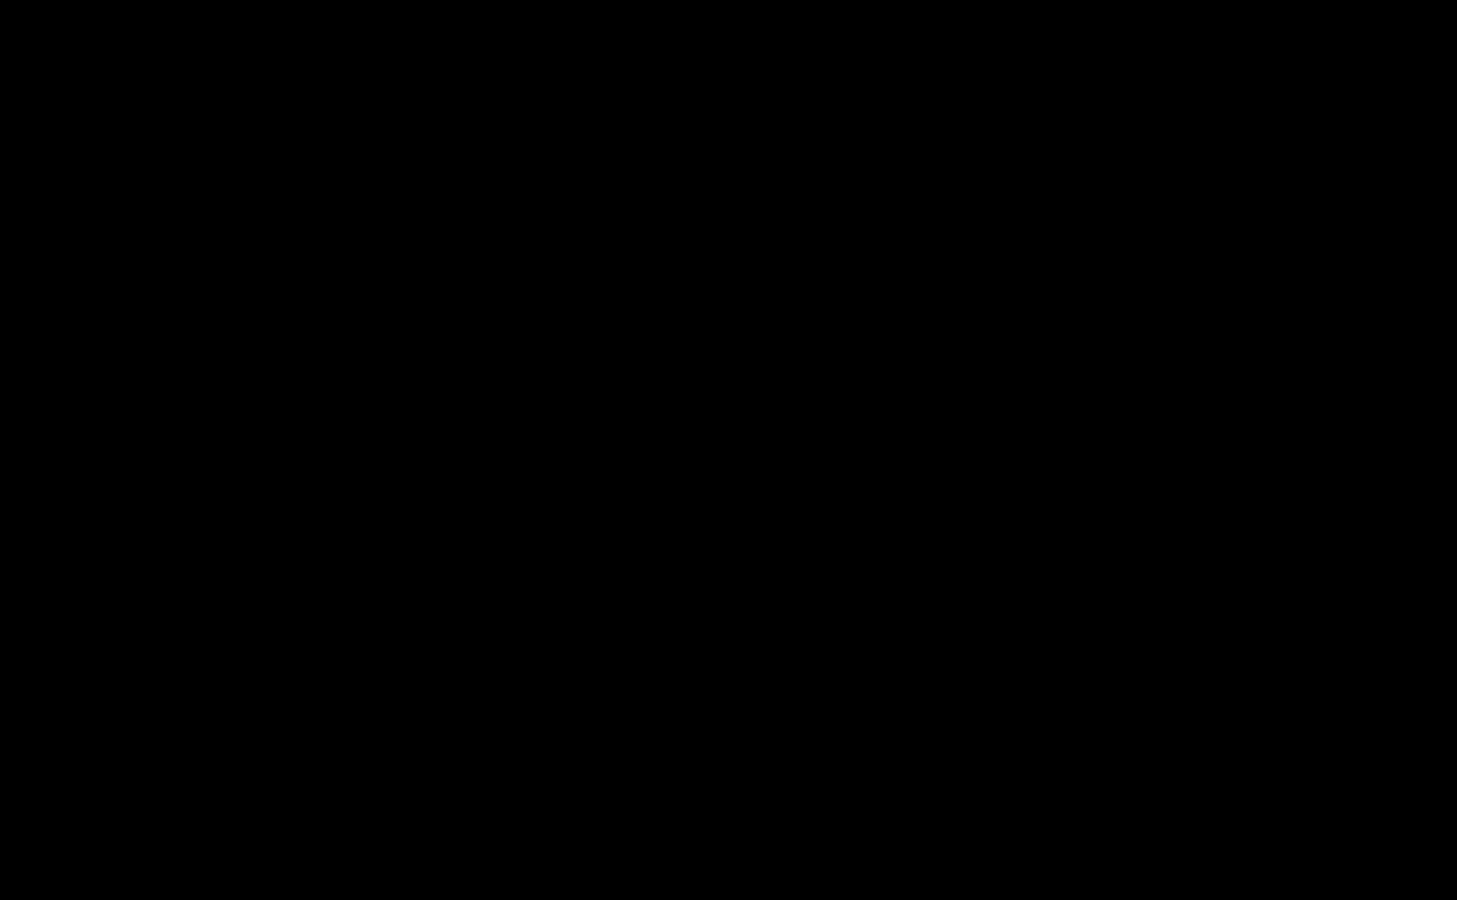 Biotin-dPEG®₁₂-TFP ester